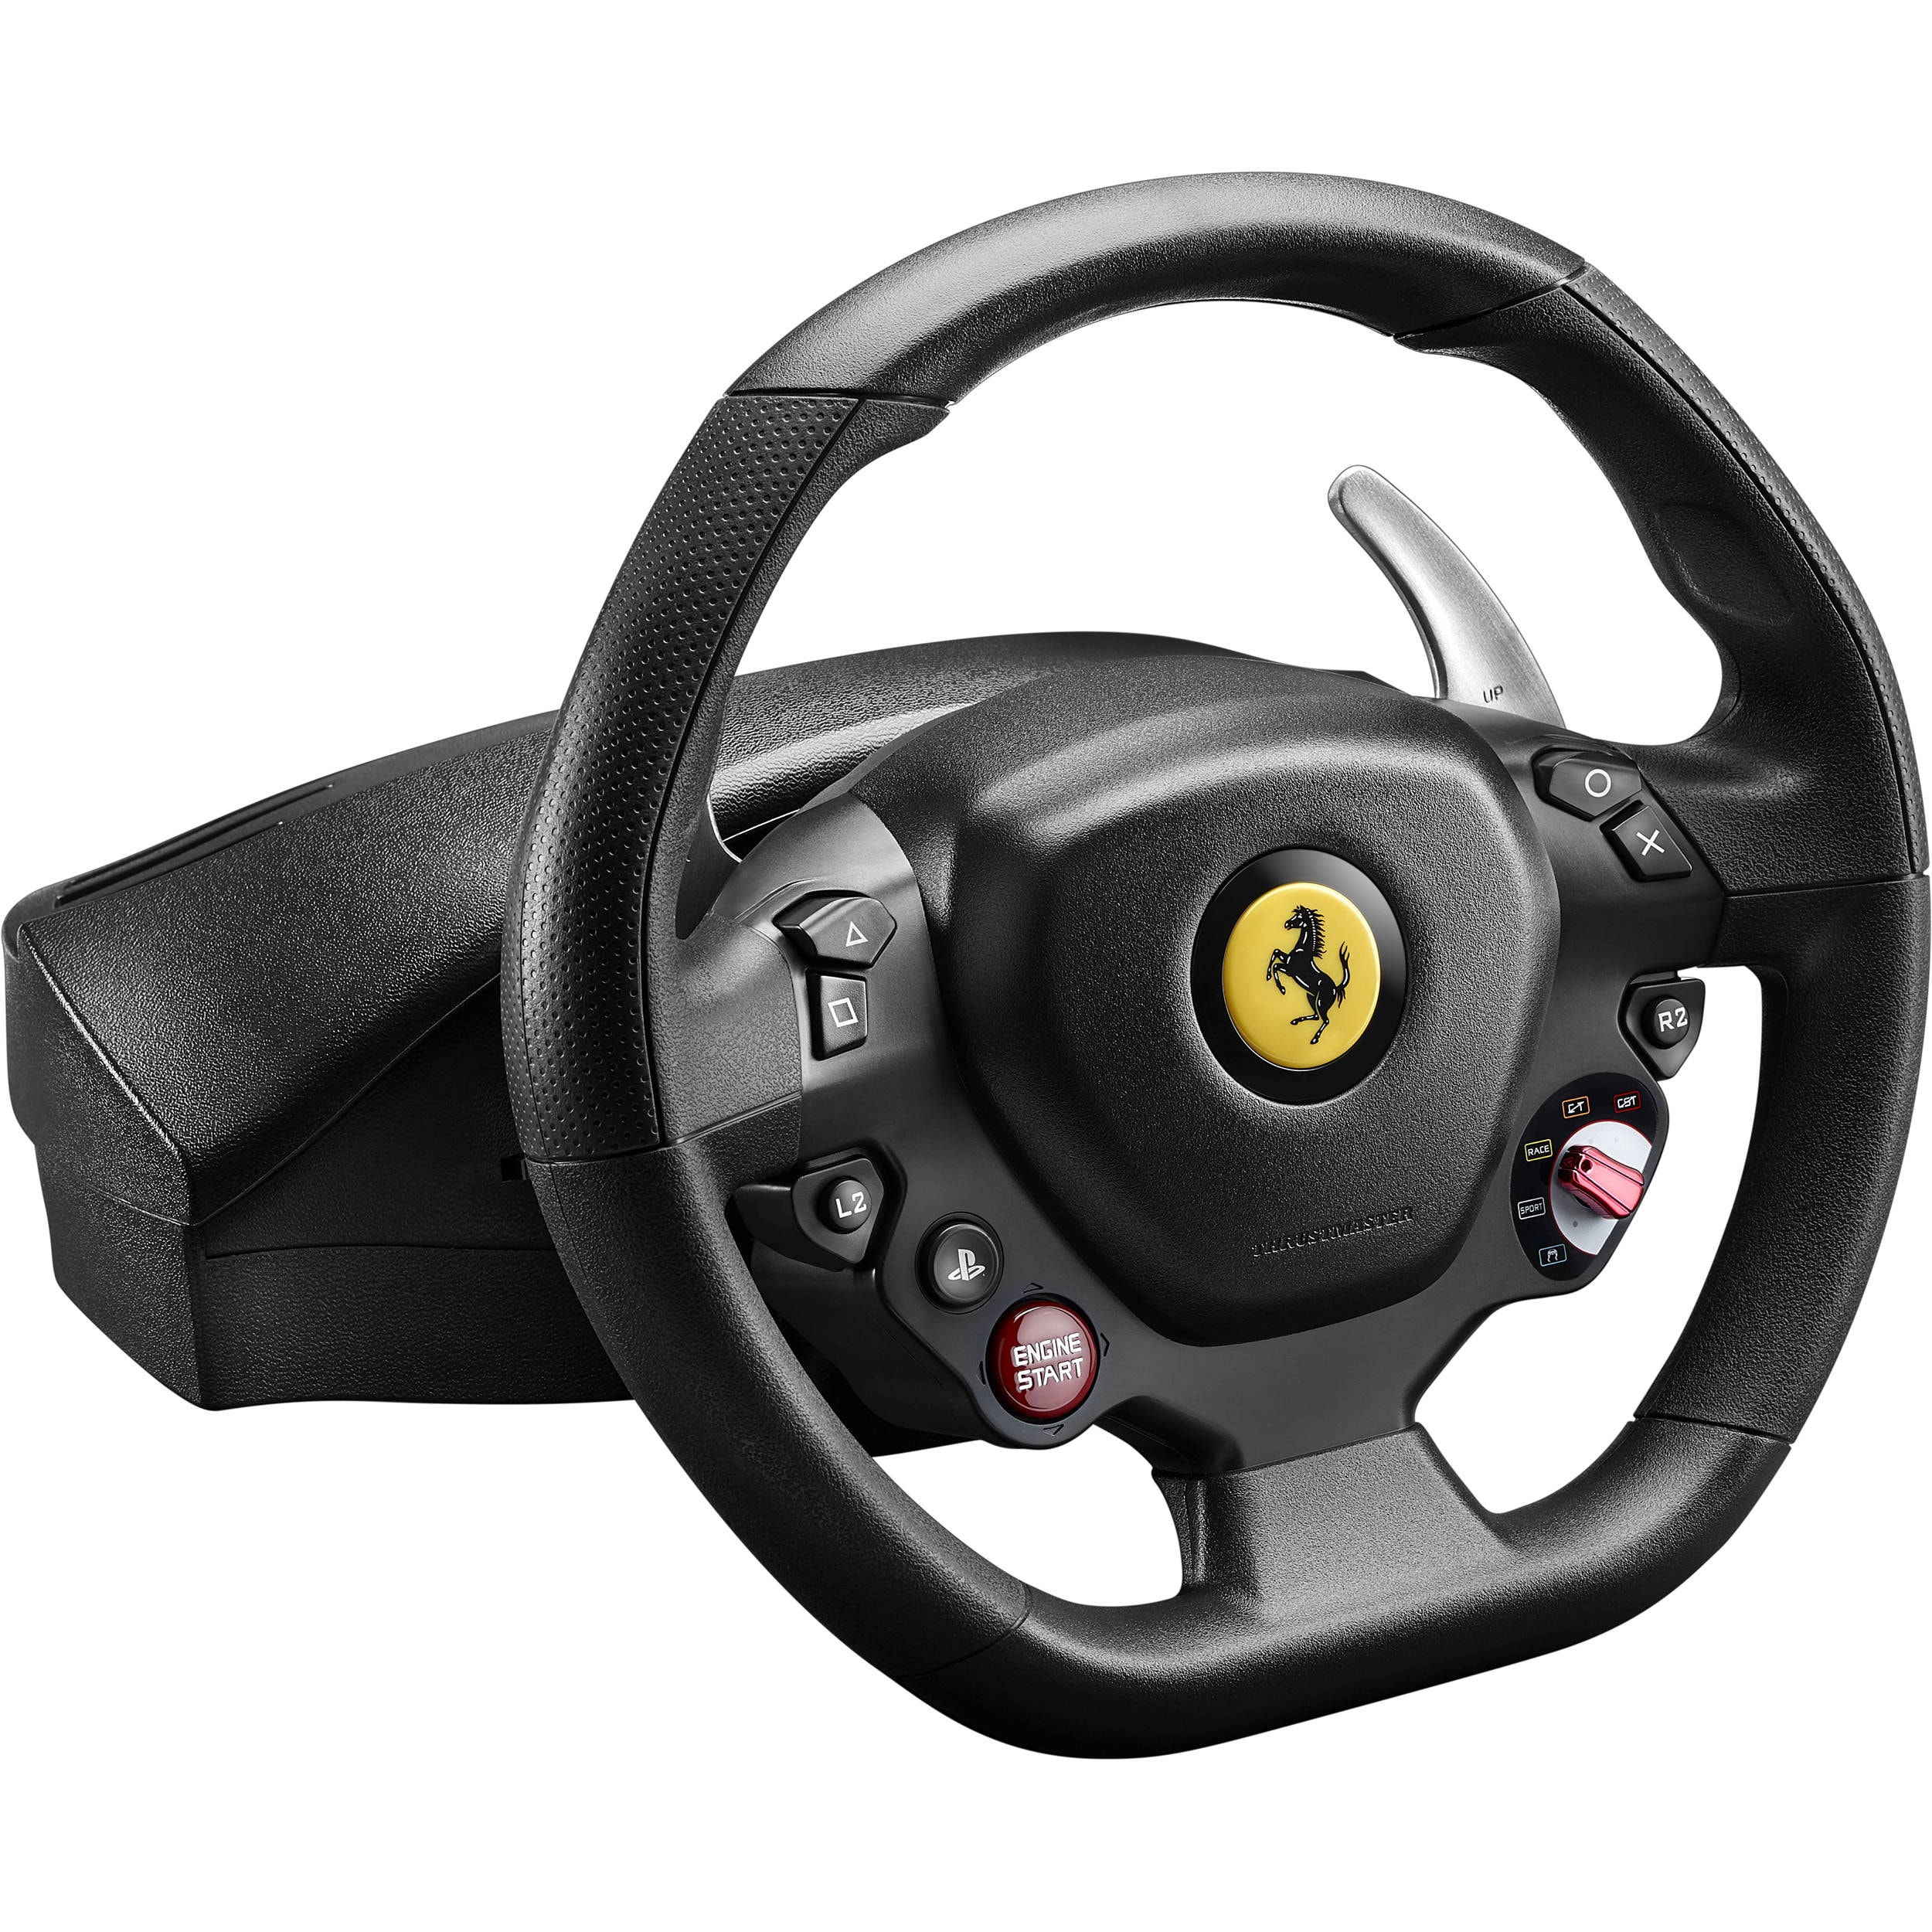 Thrustmaster Driving Wheel T80 Ferrari - GTB Edition (PC, PS4) - Black - 2